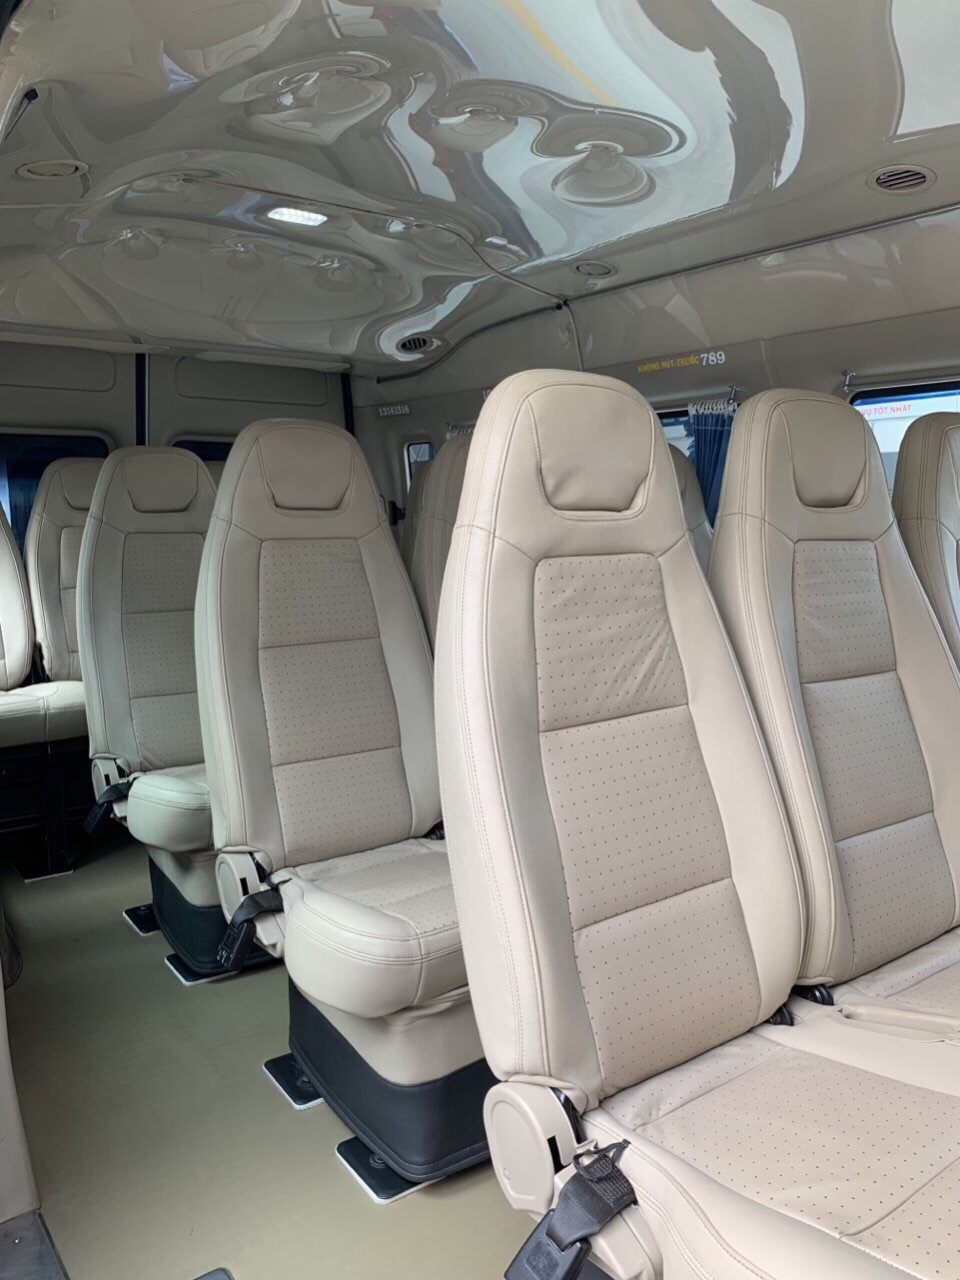 Ford transit luxury 2016 - rất đẹp - 4